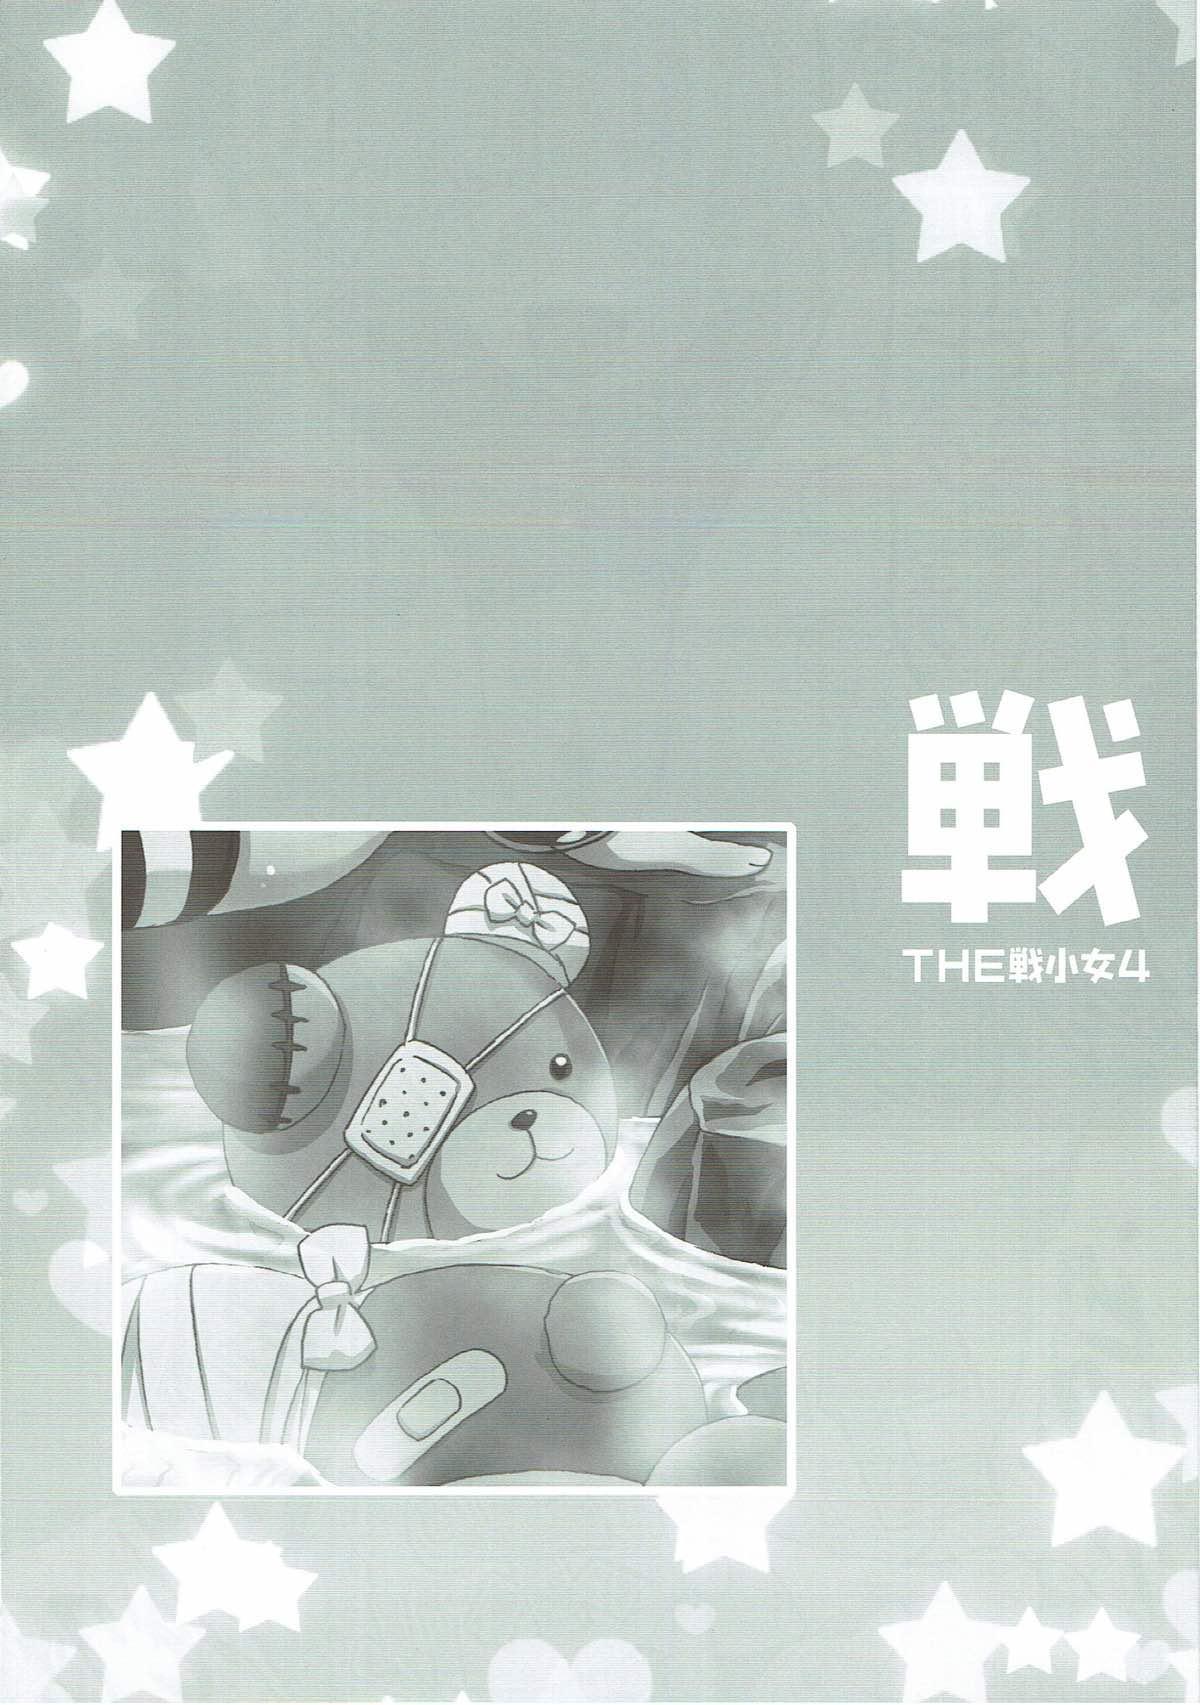 THE Senkome 4 78